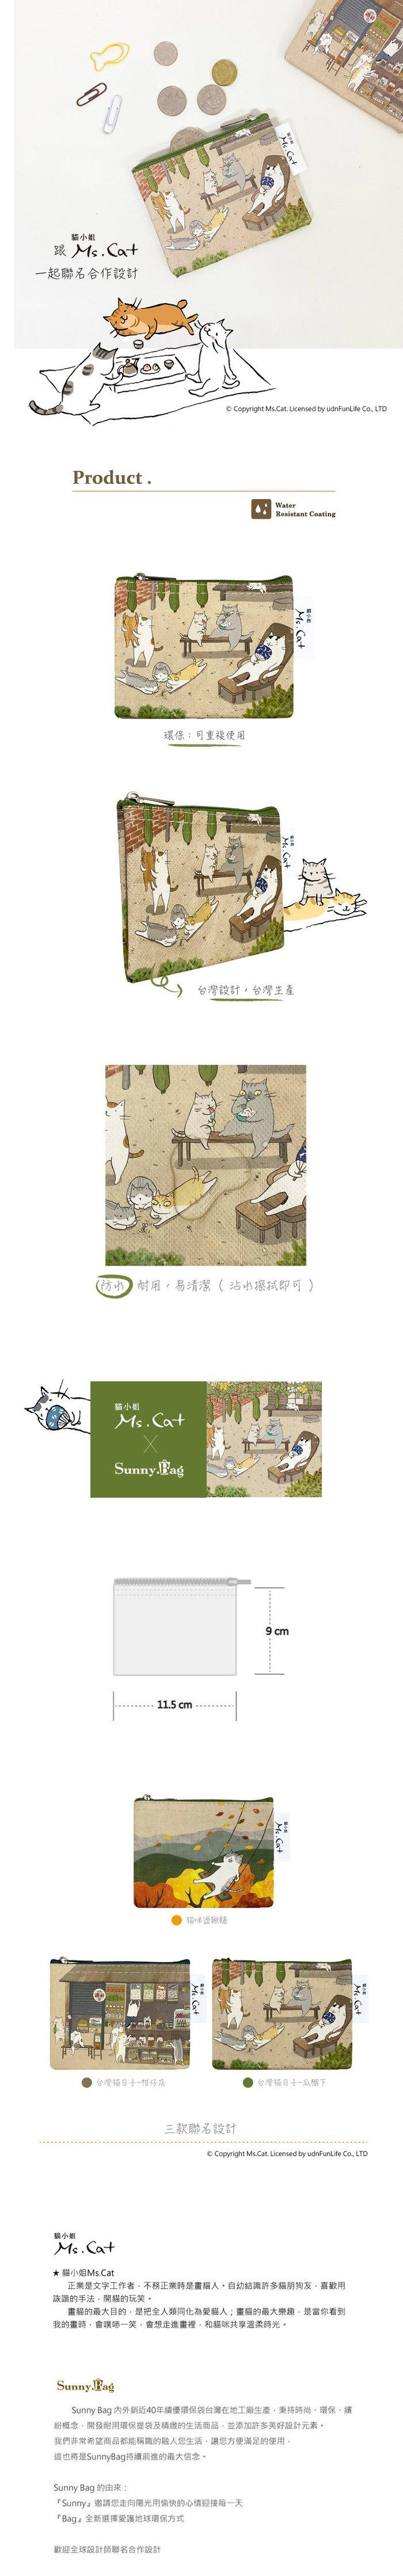 Sunny Bag x 貓小姐Ms.Cat-零錢包_台灣貓日子-瓜棚下